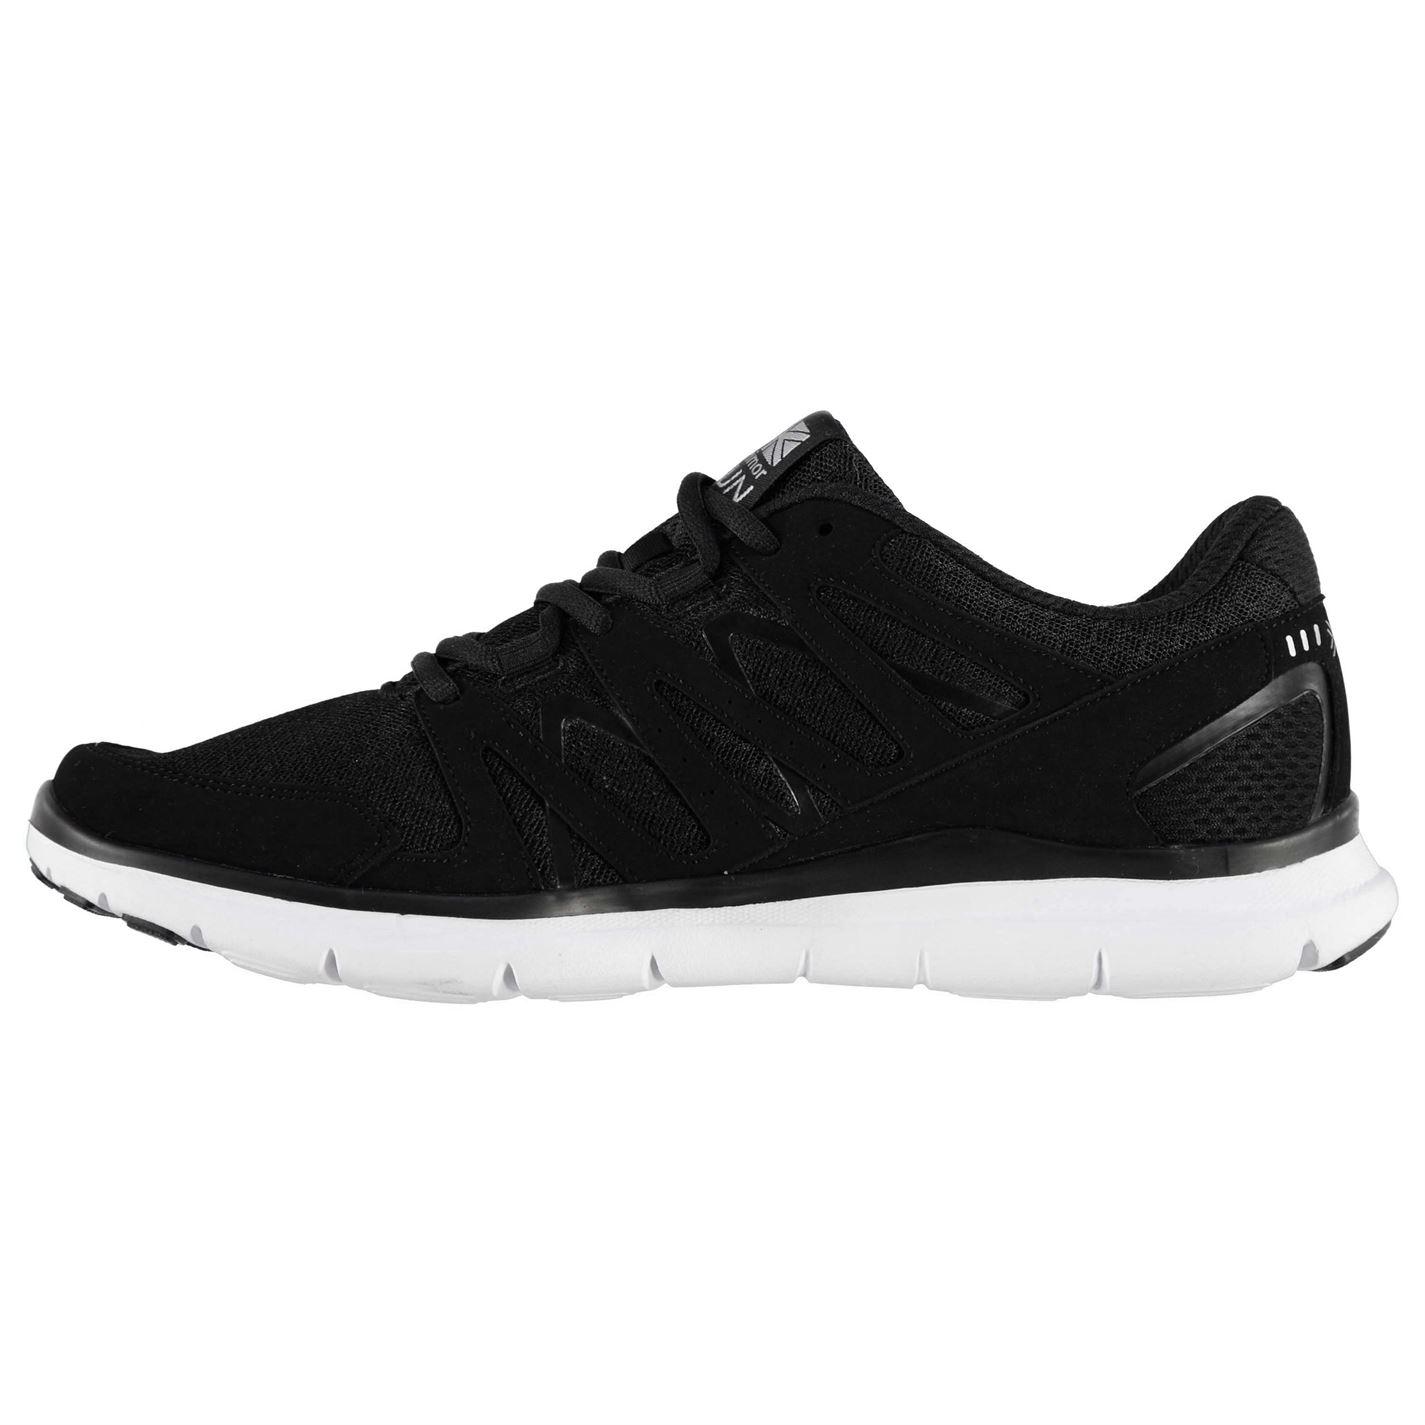 Karrimor-Mens-Duma-Trainers-Lace-Up-Sports-Running-Cross-Training-Shoes thumbnail 19